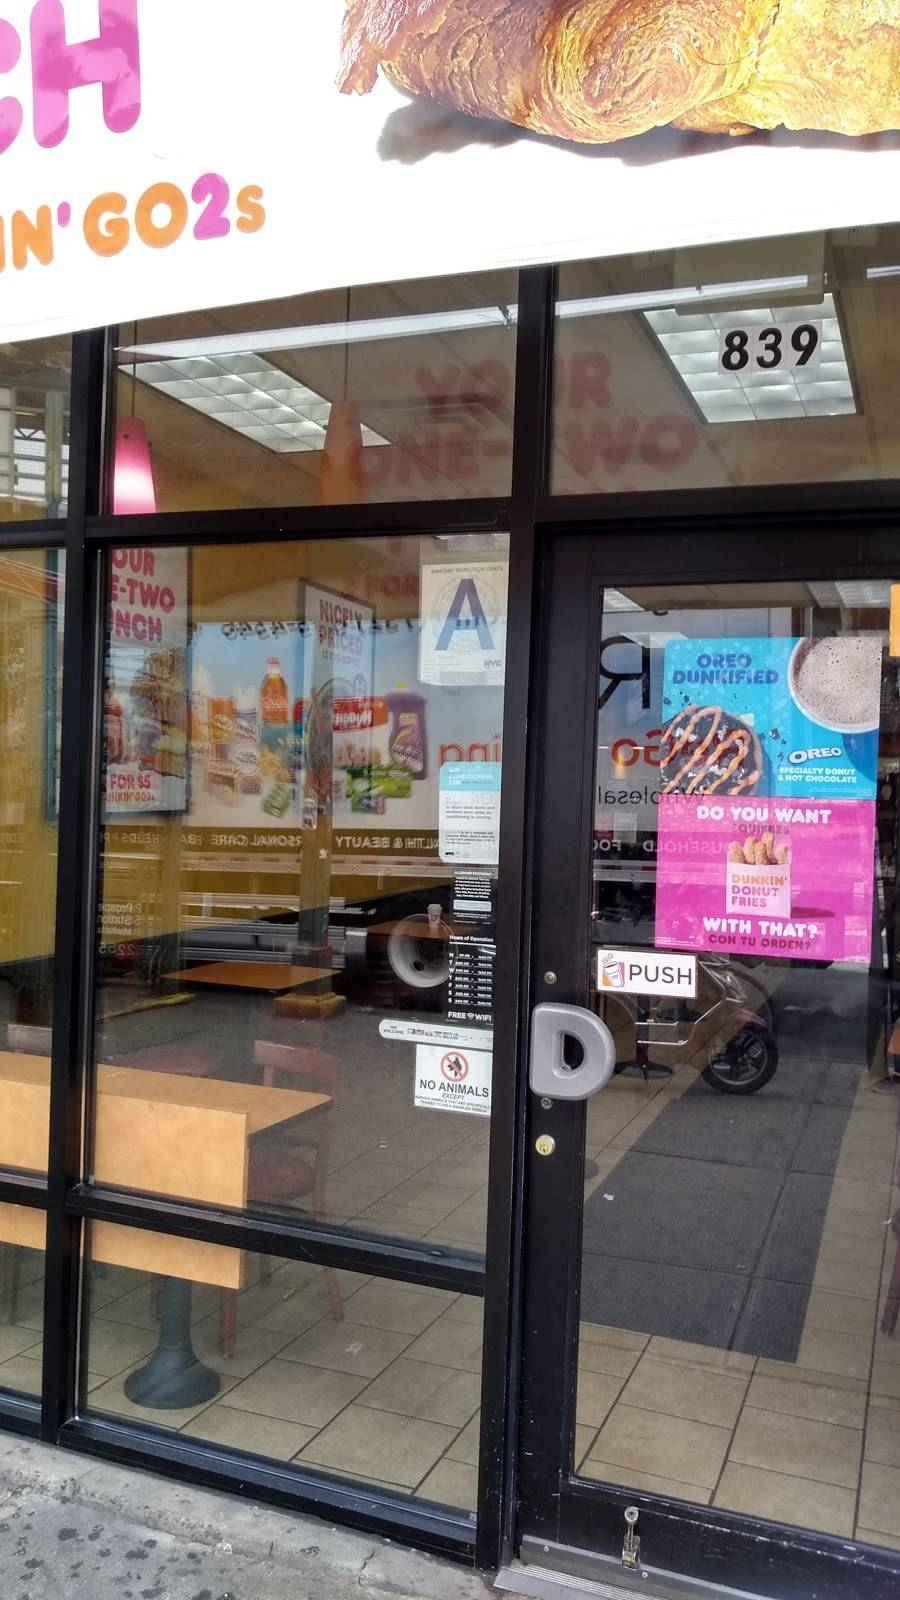 Subway Restaurants | restaurant | 839 Prospect Ave, Bronx, NY 10459, USA | 7187085330 OR +1 718-708-5330